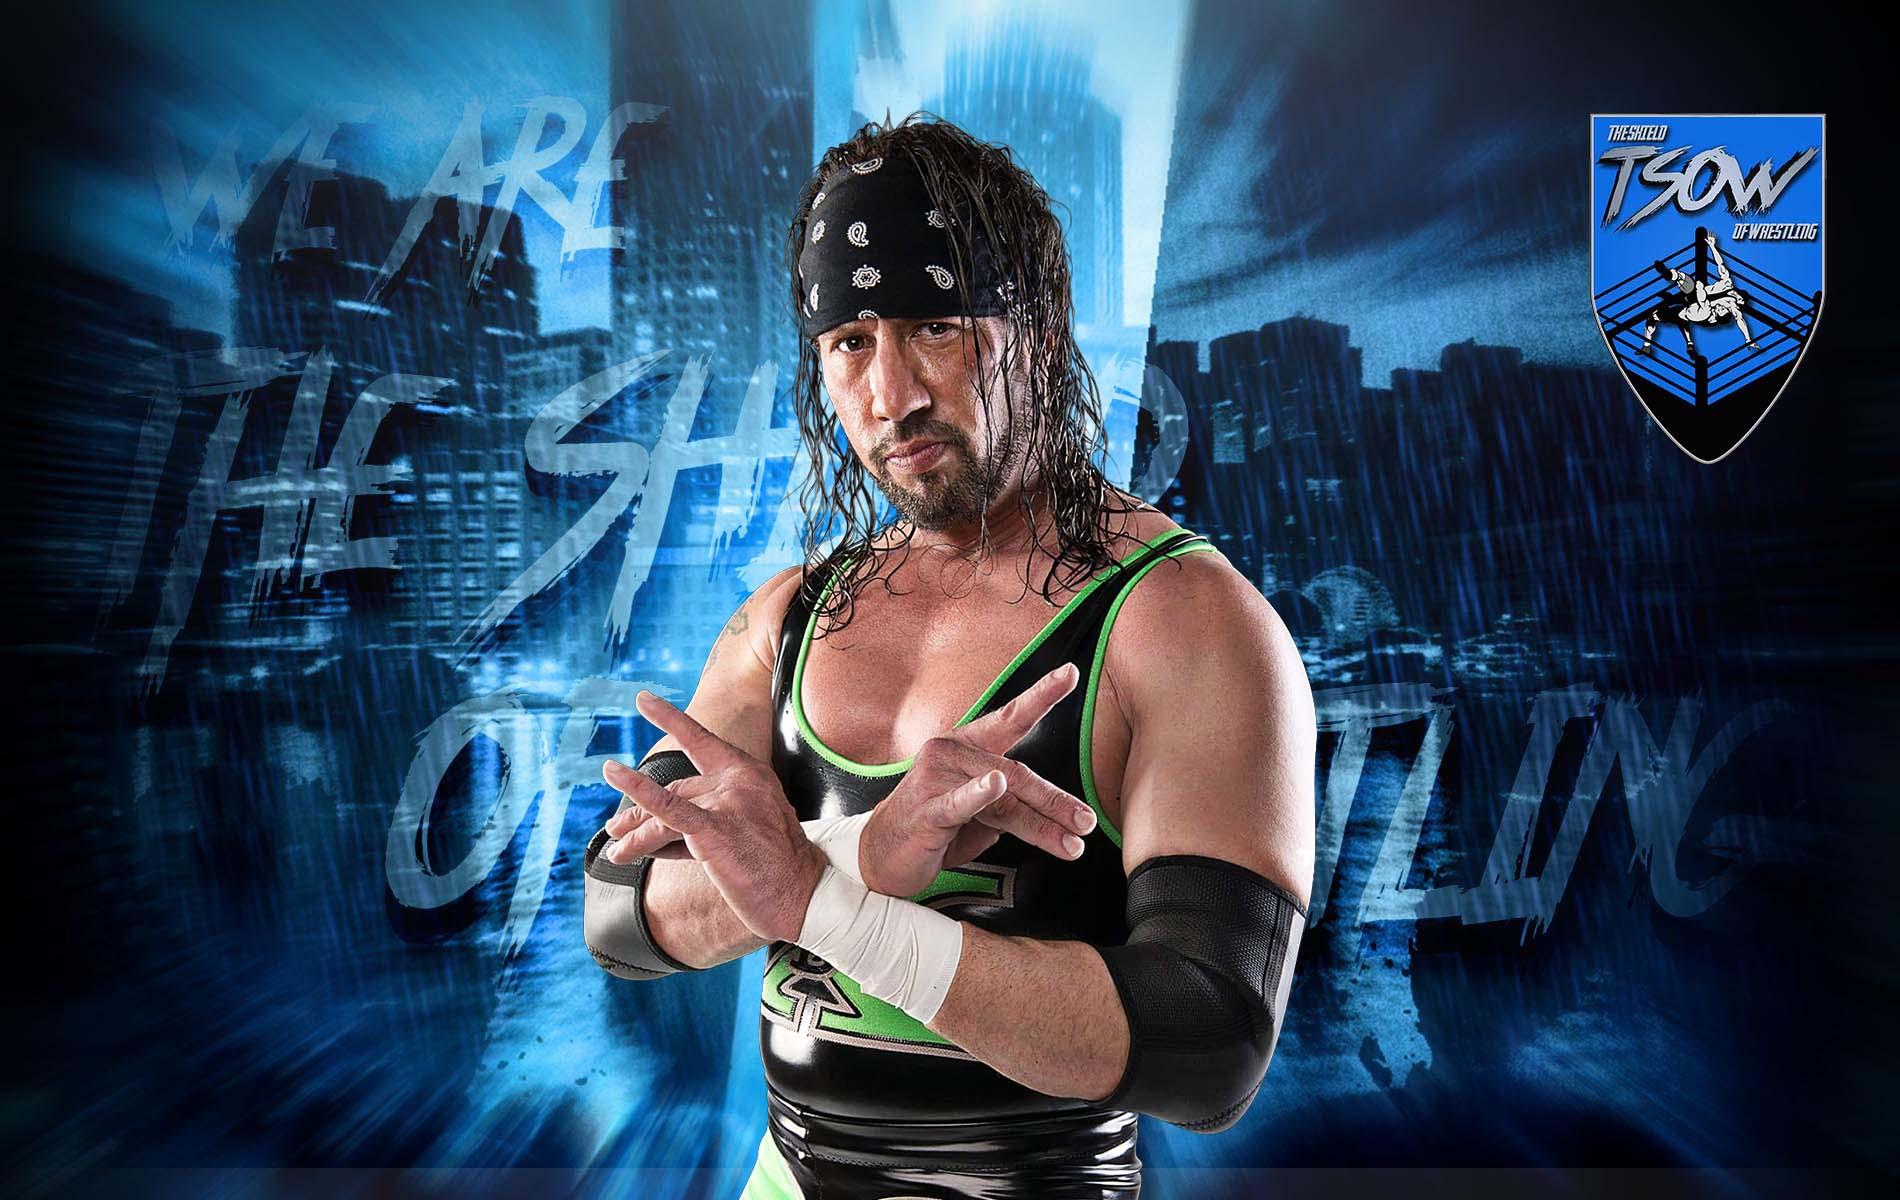 Sean Waltman apre ad un match contro Sami Zayn